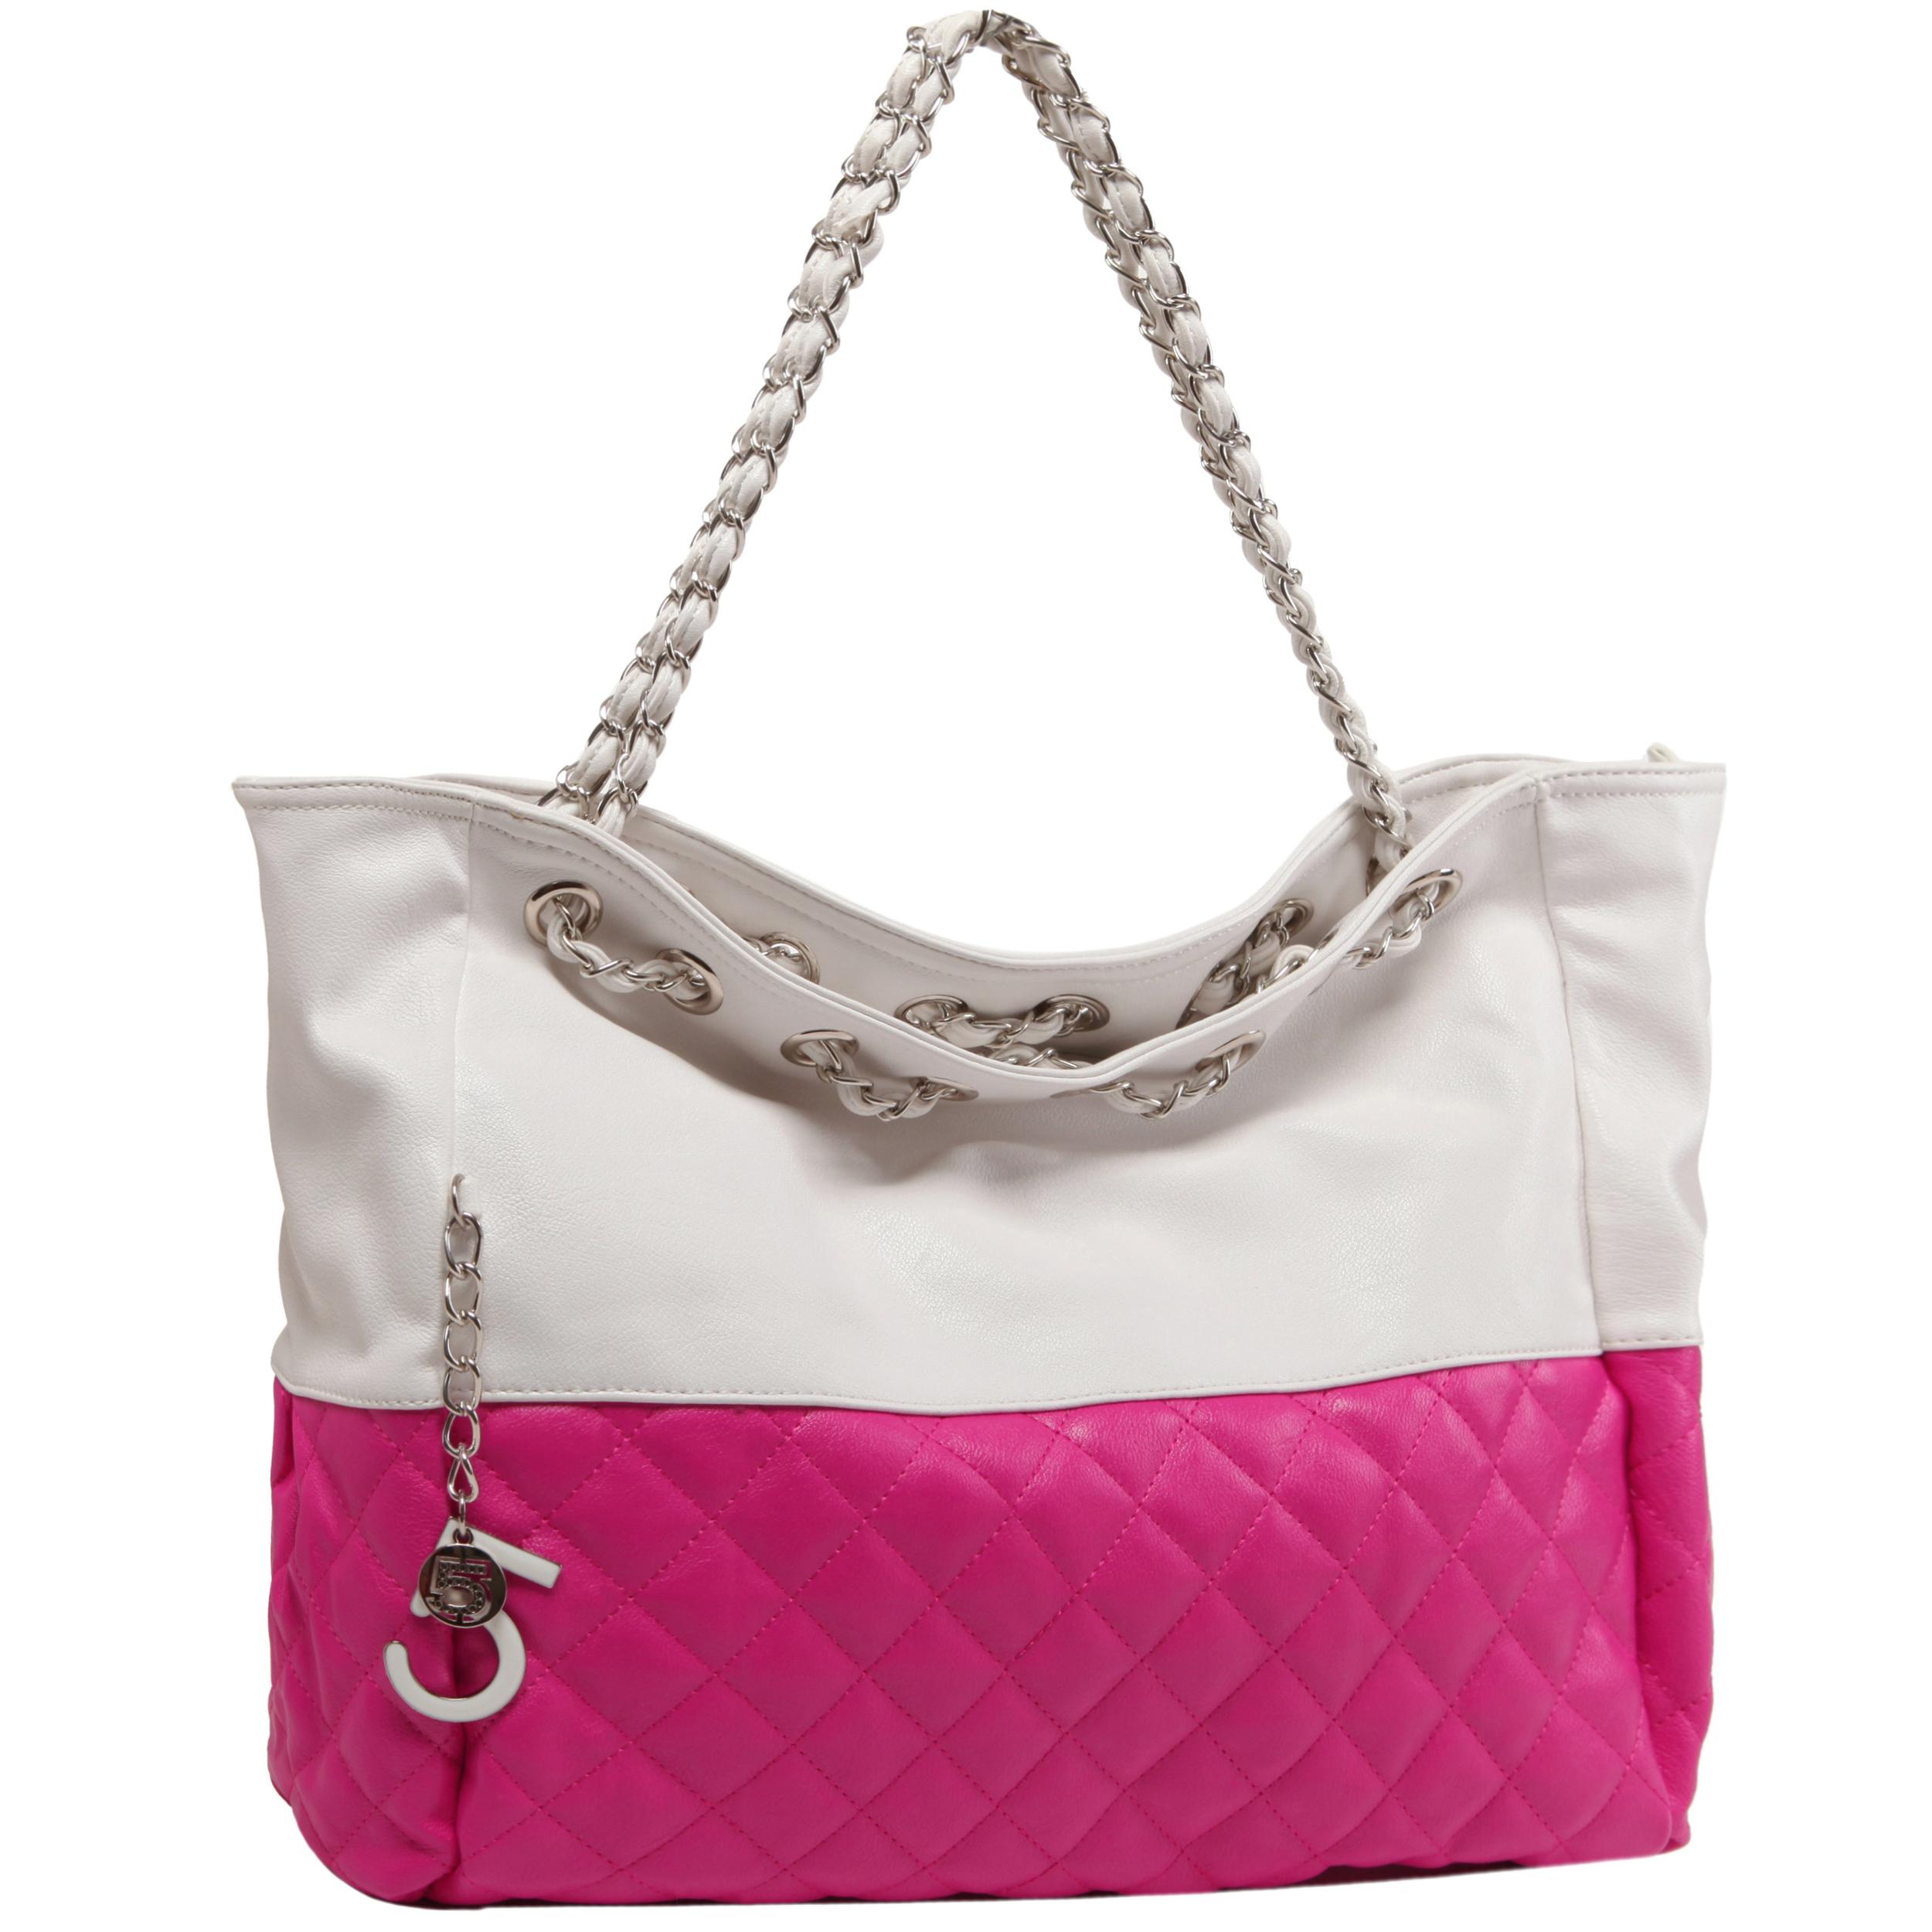 CAMRYN Pink Shoulder Tote Handbag main